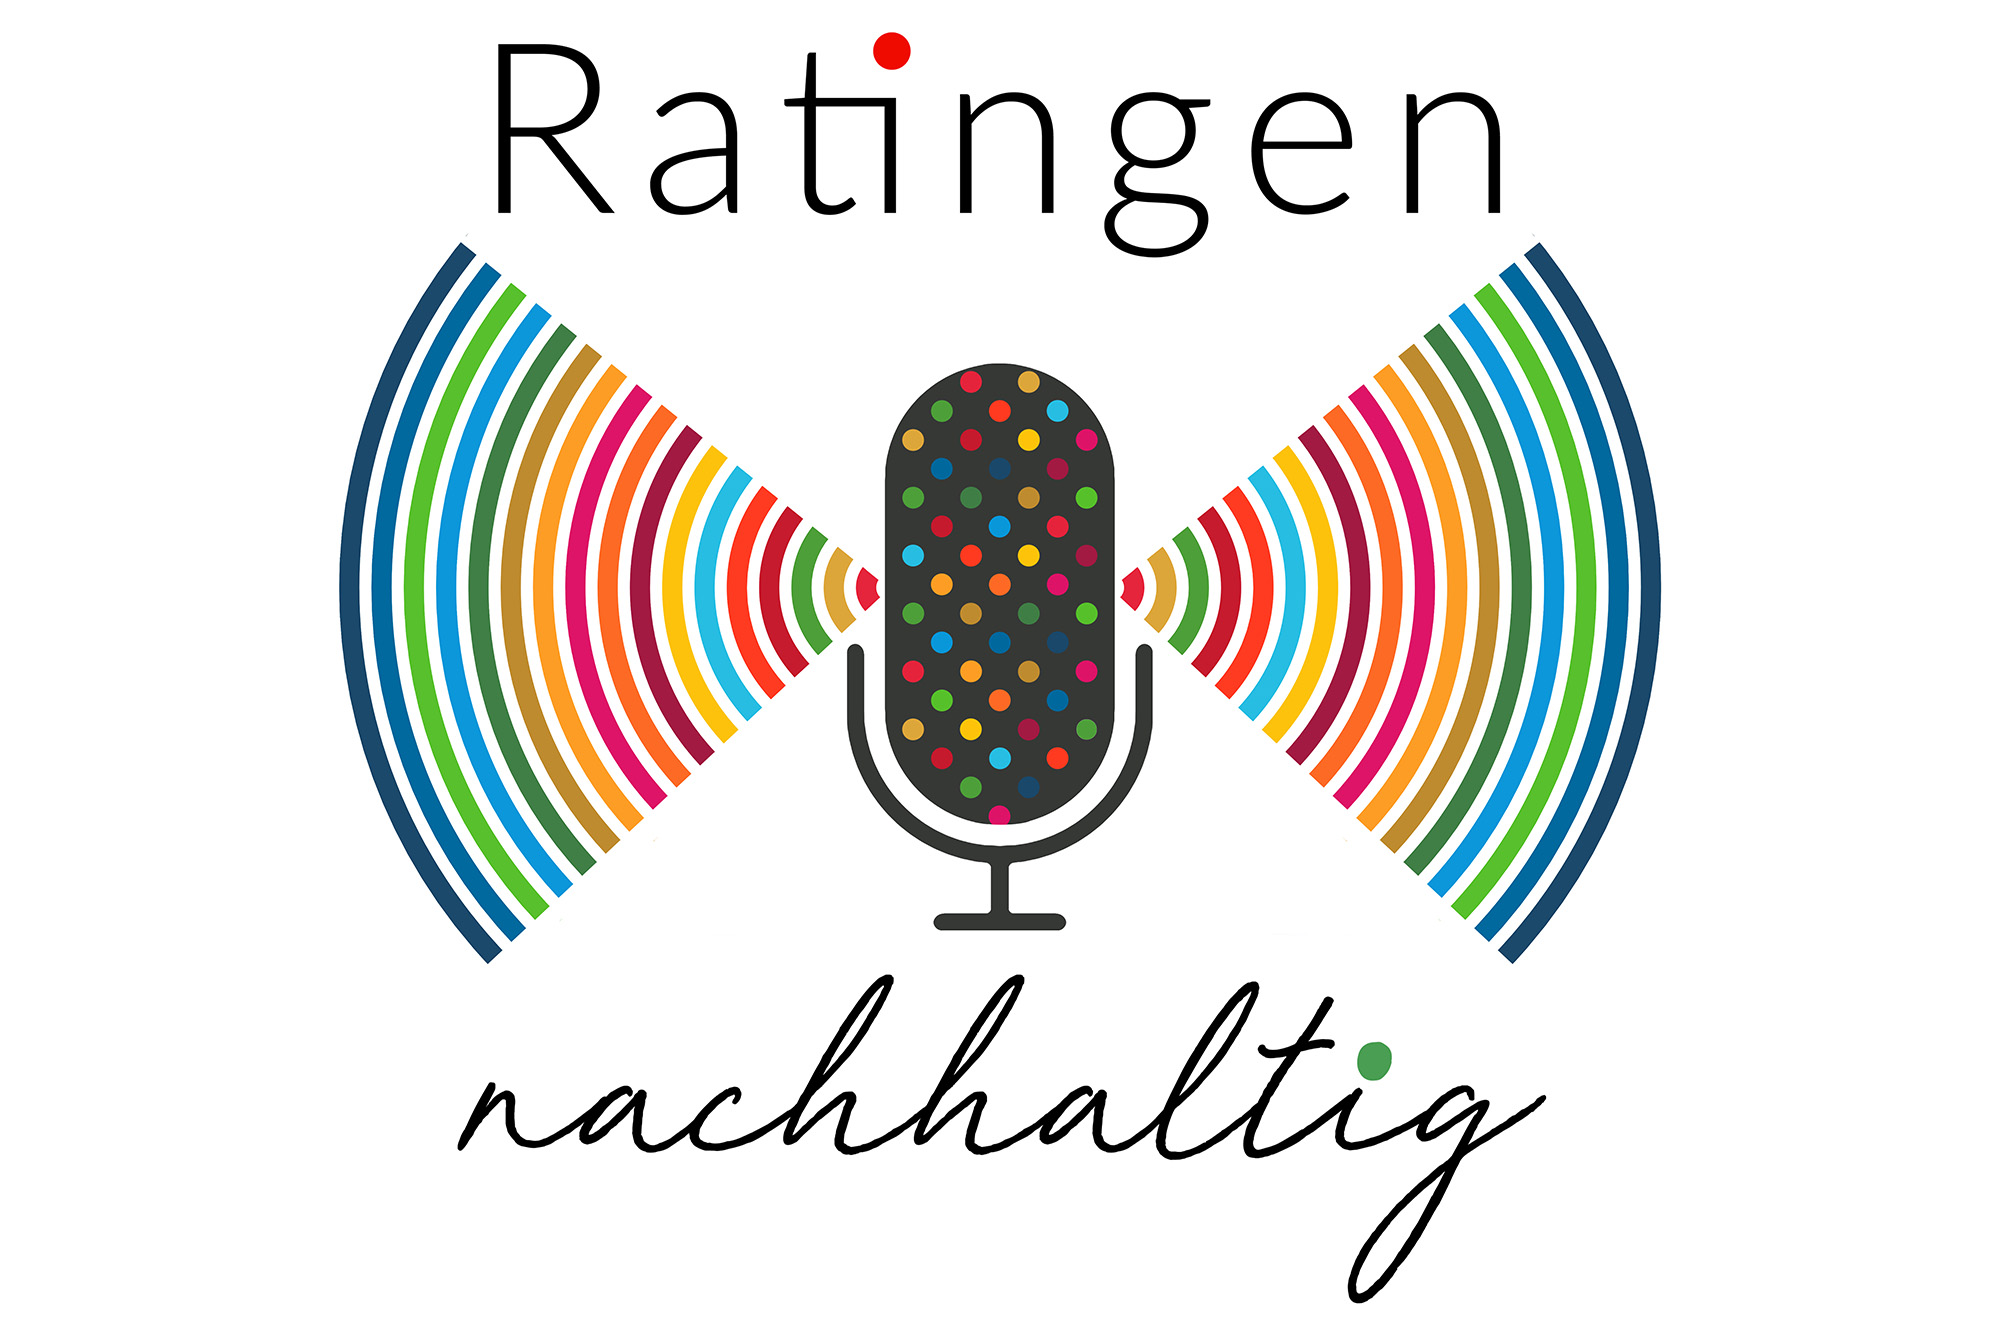 NEU: Der Ratingen.nachhaltig-Podcast